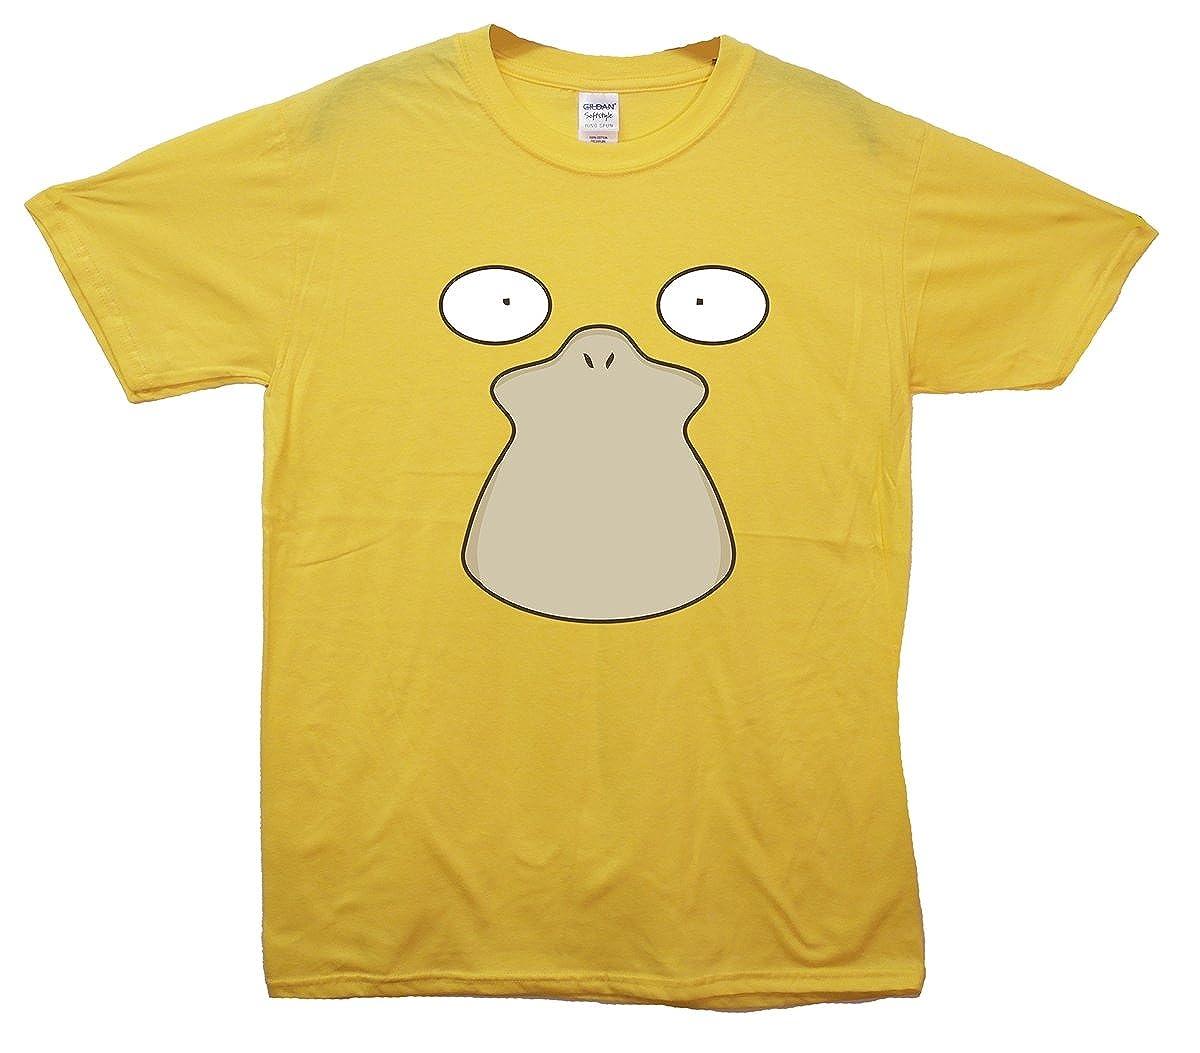 6bc9b371 Minamo Pokemon Face Design Psyduck T-Shirt: Amazon.co.uk: Clothing